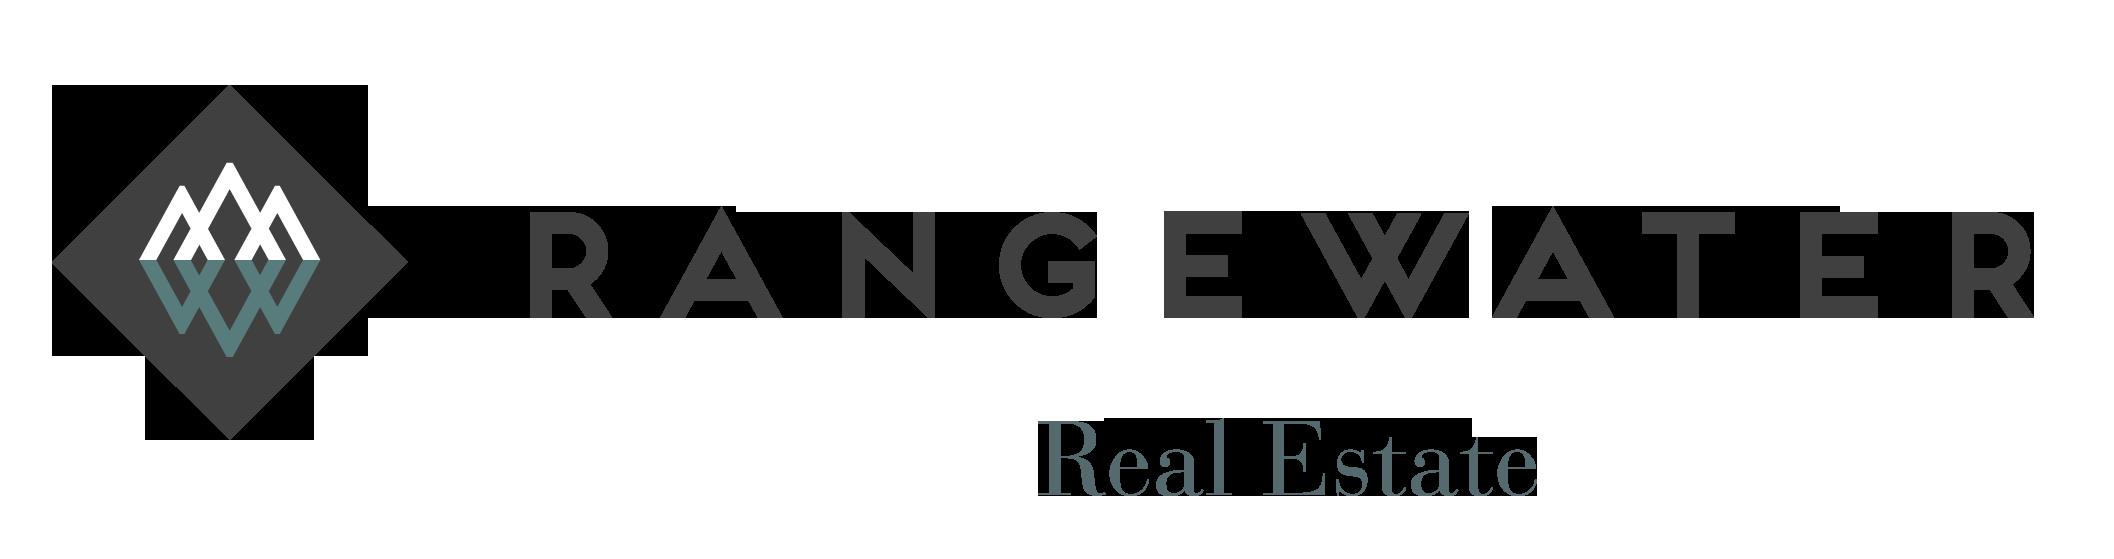 RangeWater Horizontal 4C Modifier Logo1.